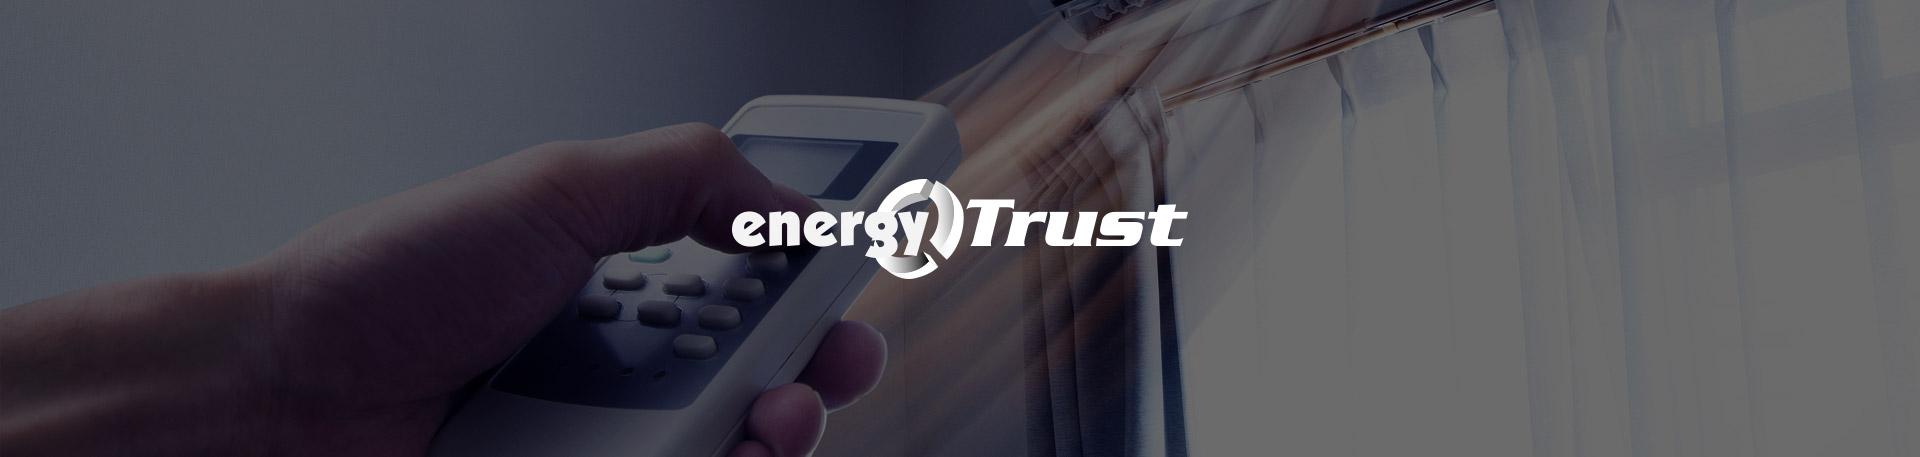 energytrust cover